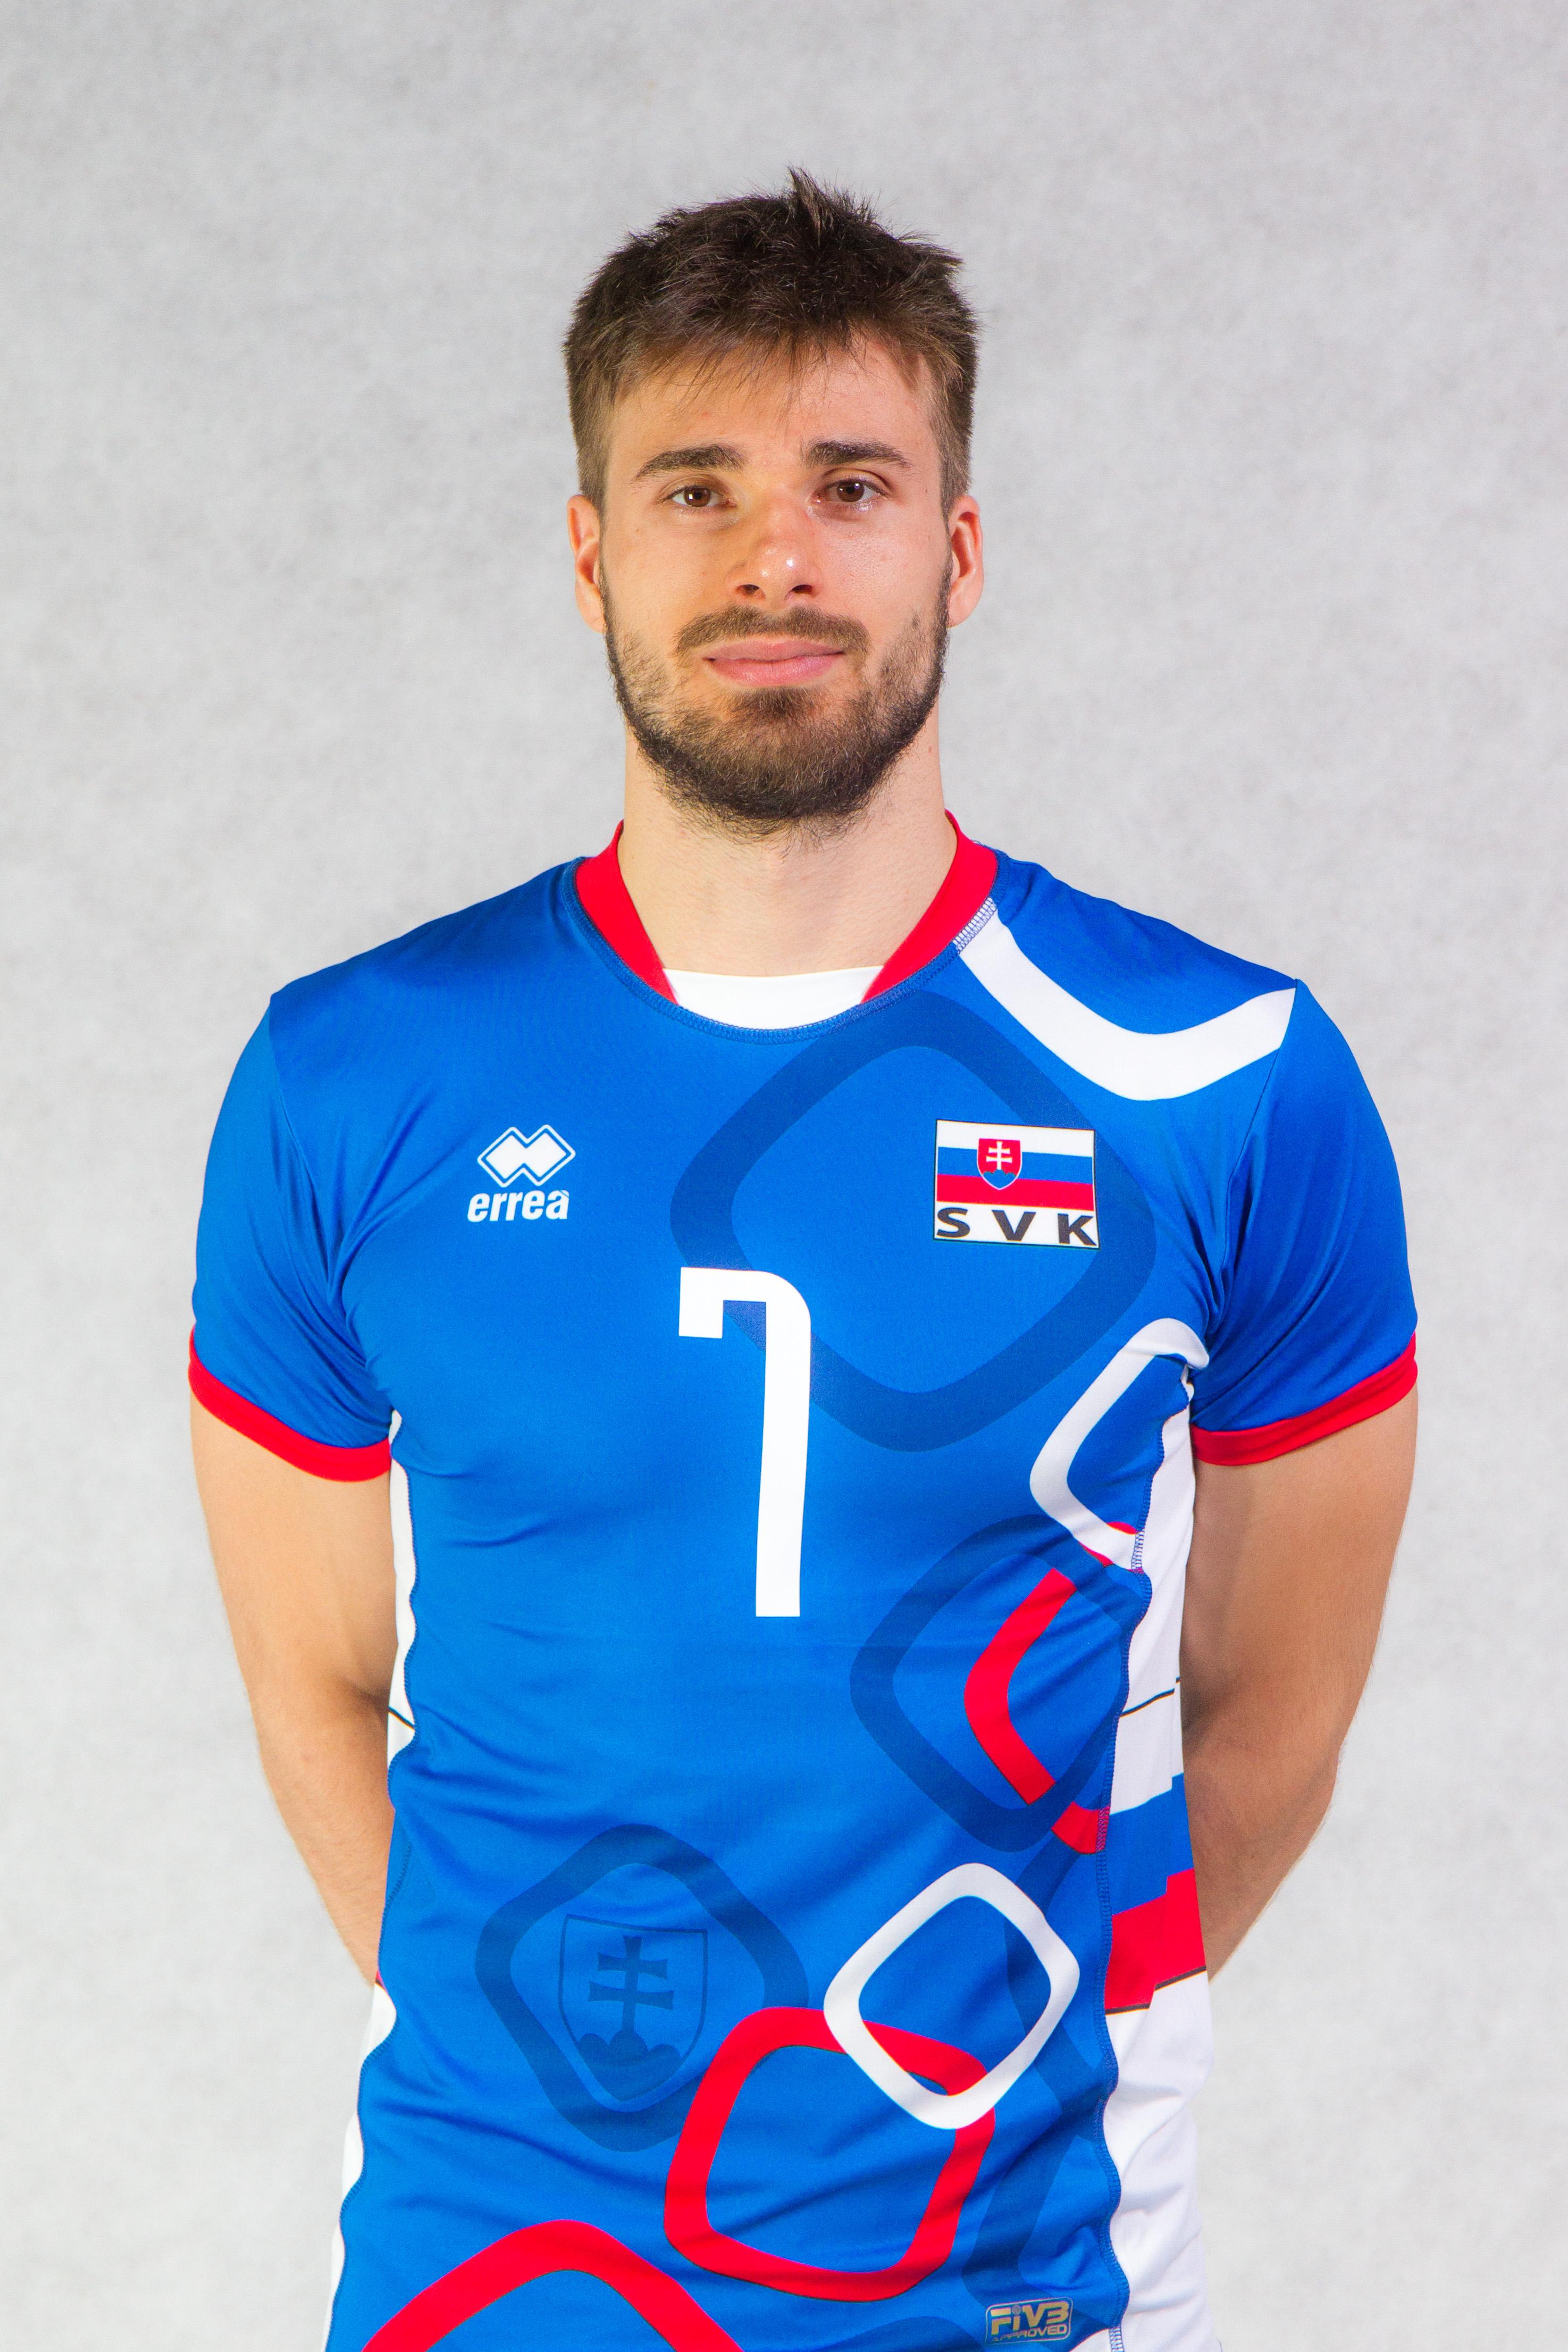 Peter Michalovic